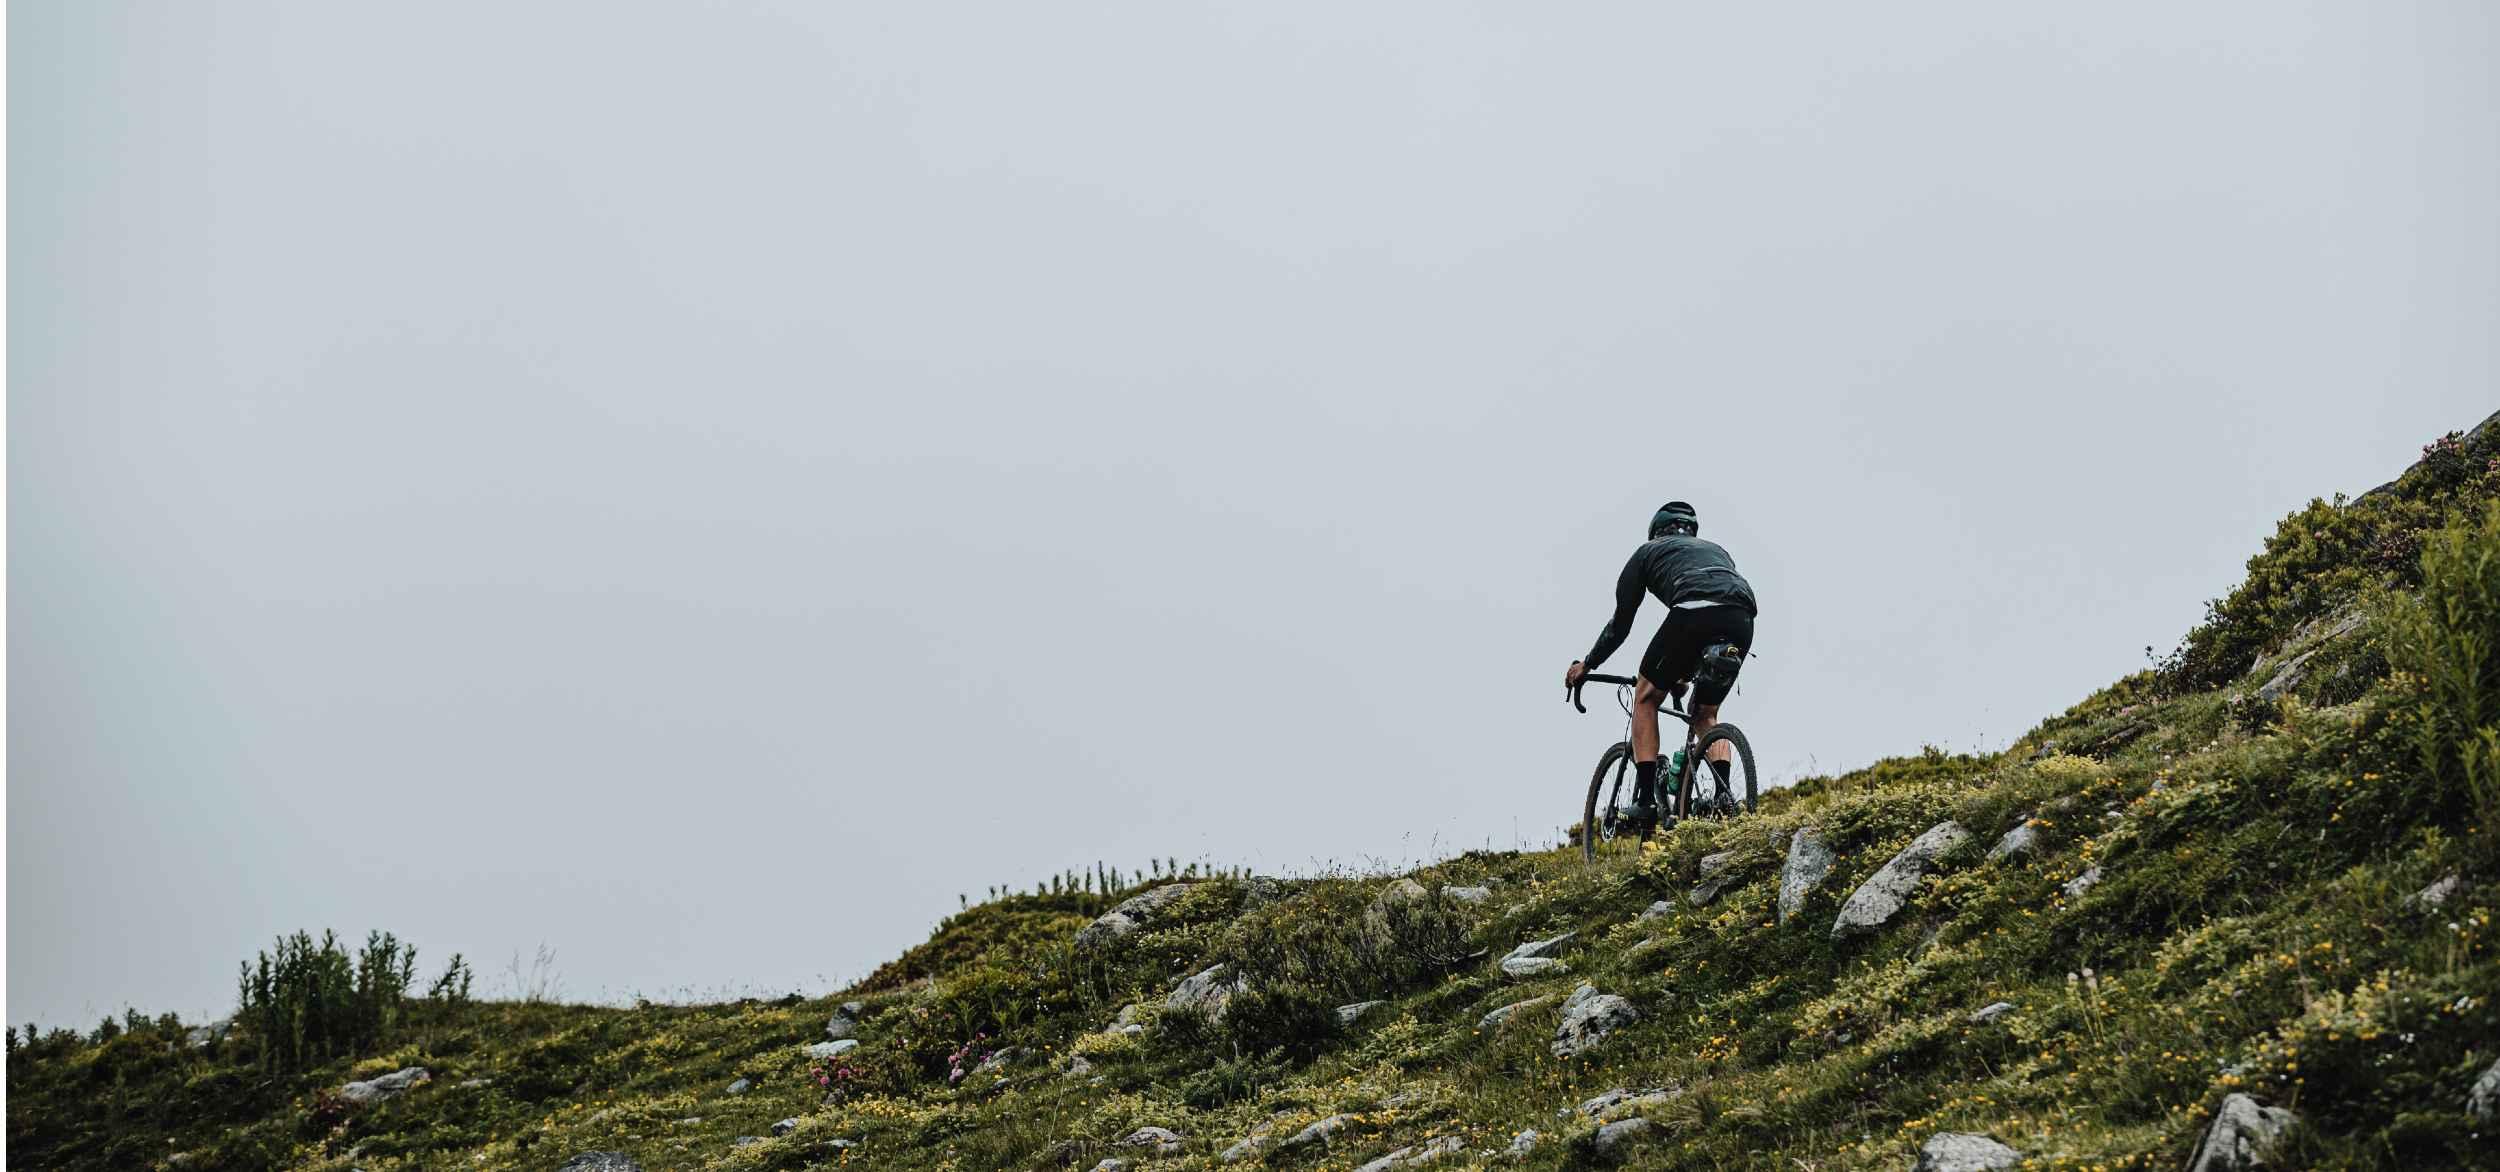 Seb rides along a ridge, backed by cloud